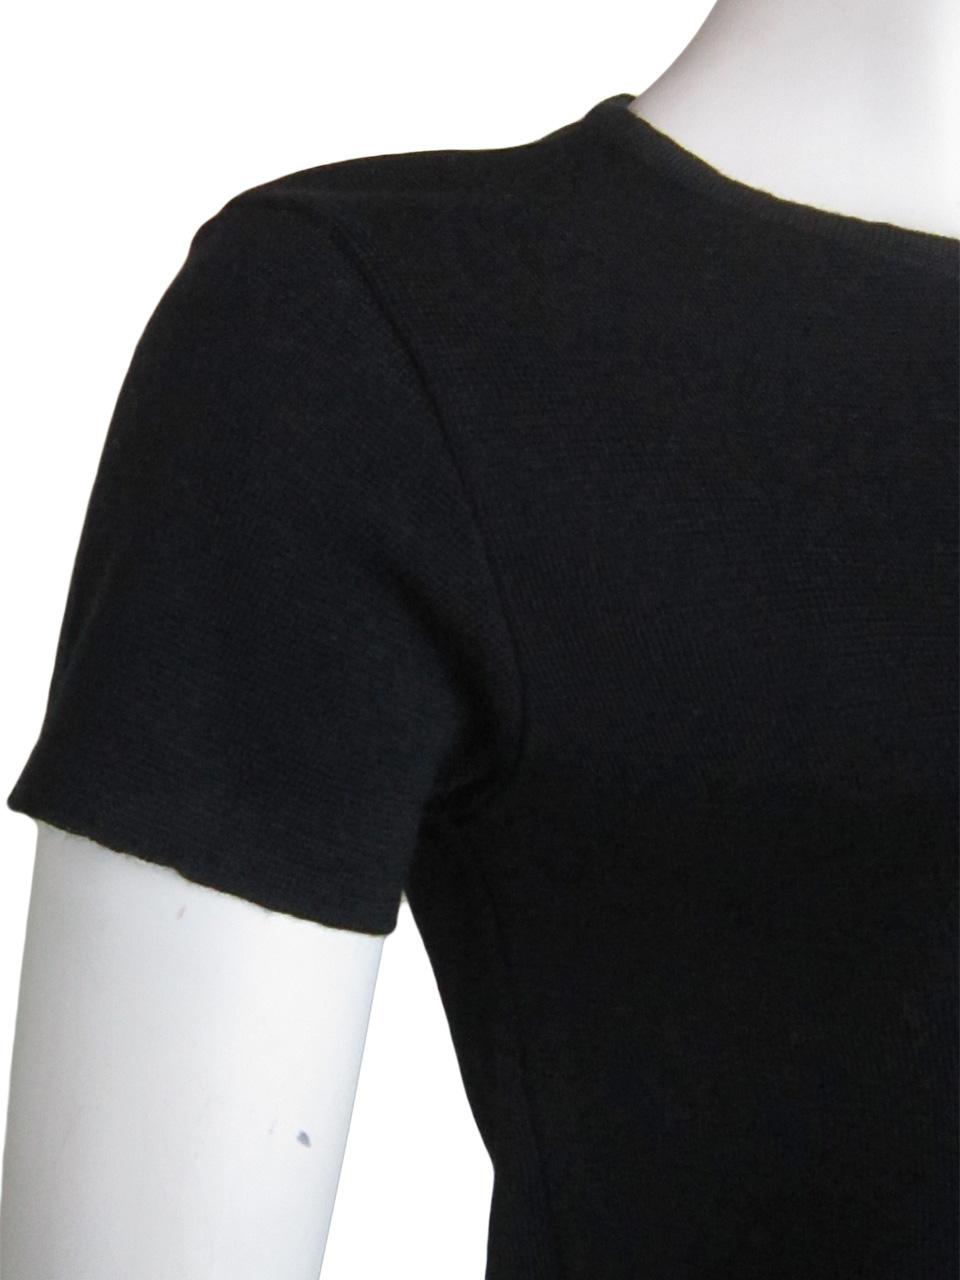 Vestito Tubino Manica Corta - Sheath Dress with Short Sleeves